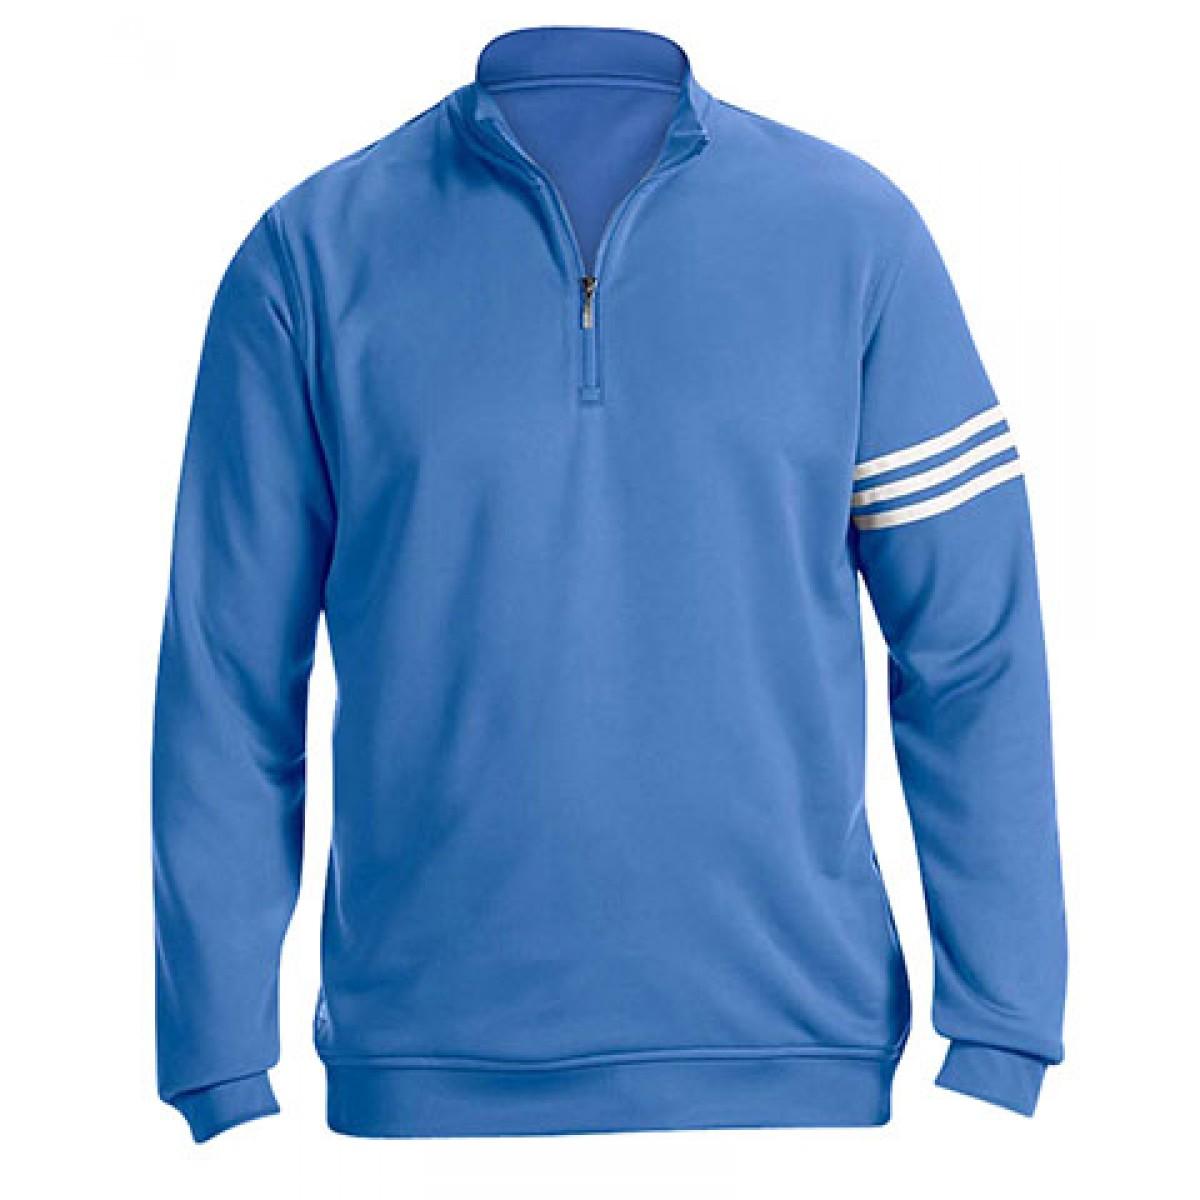 Adidas Golf Men's ClimaLite® 3-Stripes Pullover-Blue-L